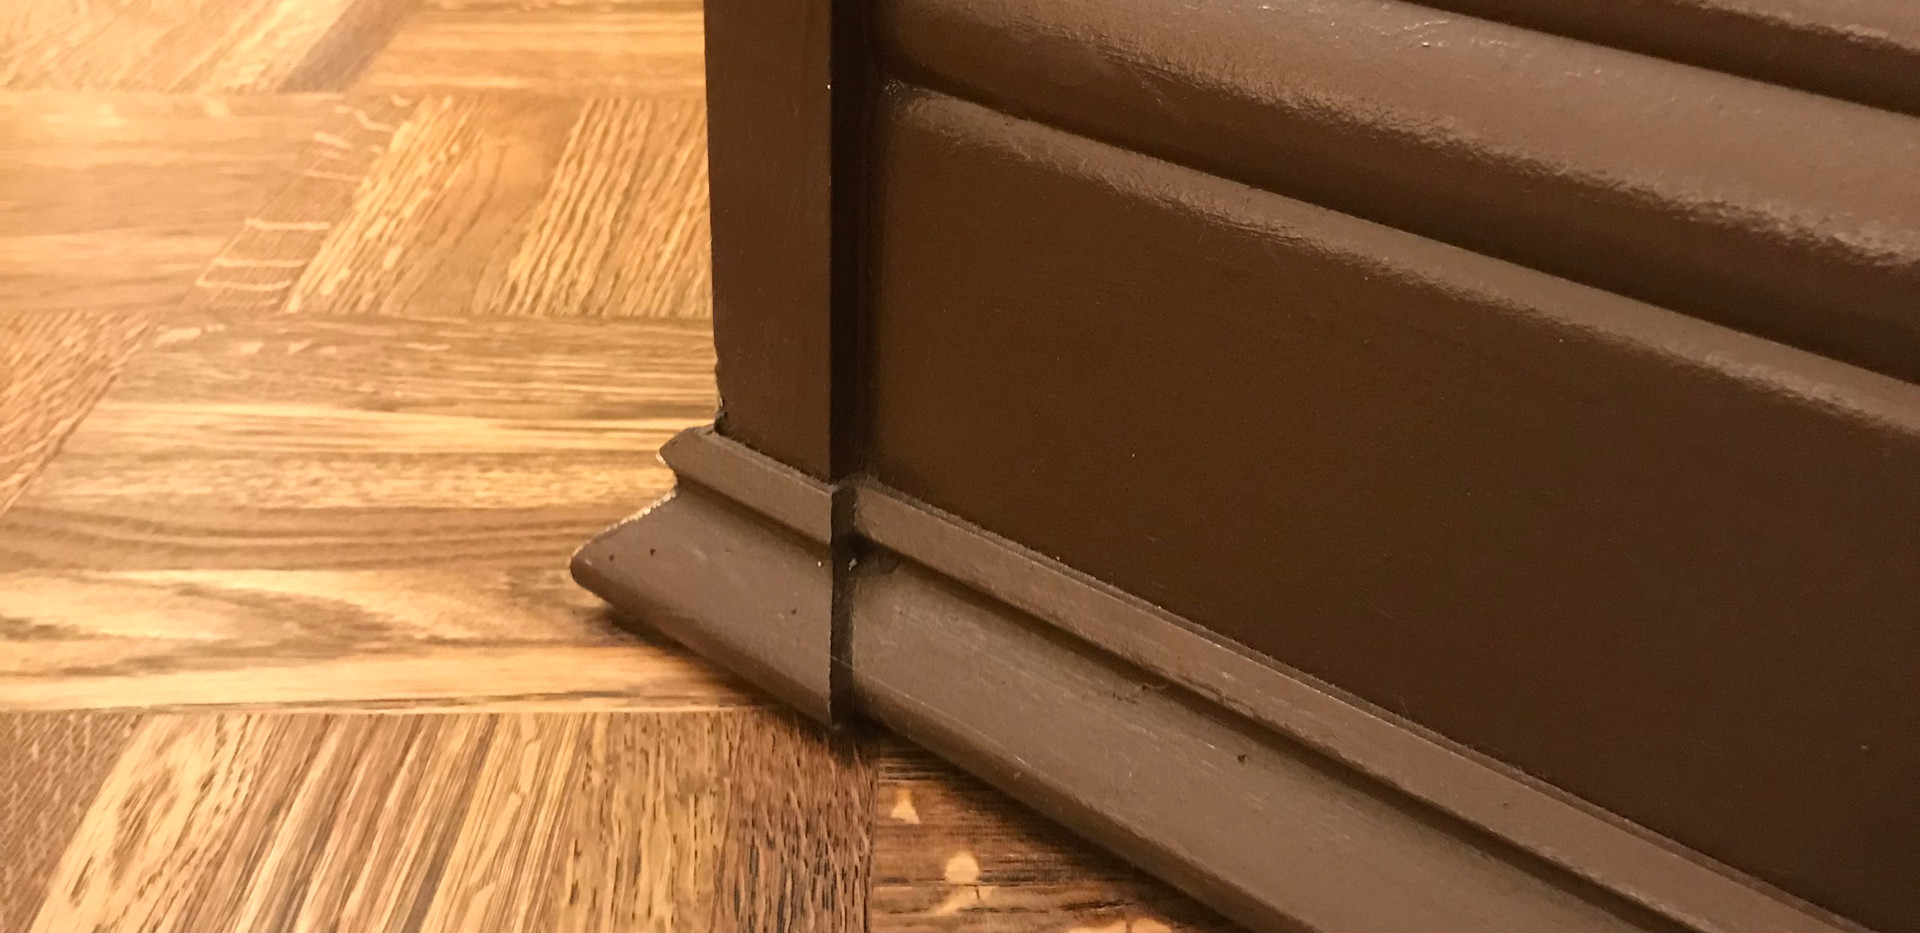 Baseboard Detail